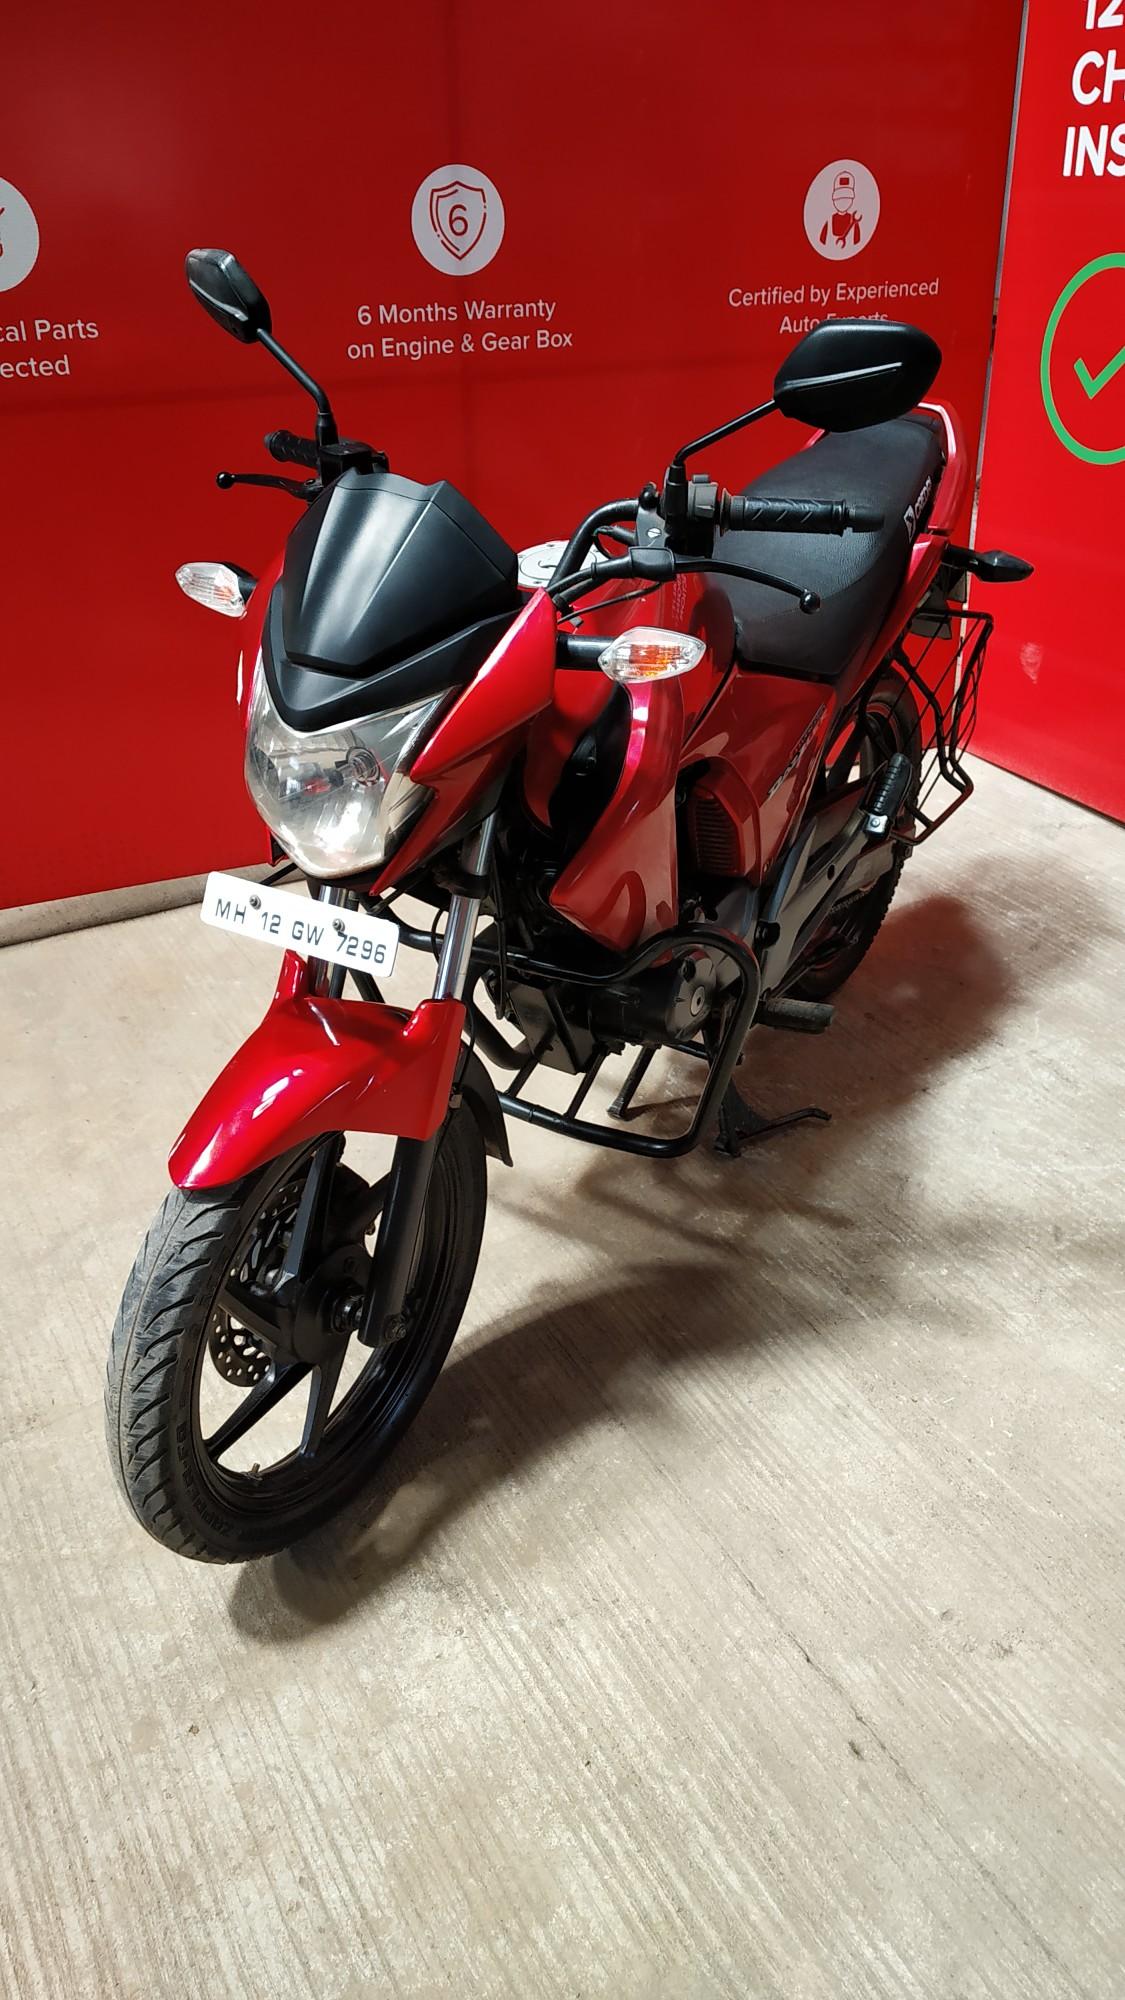 Honda Unicorn Unicorn refurbished bike at best price   CredR